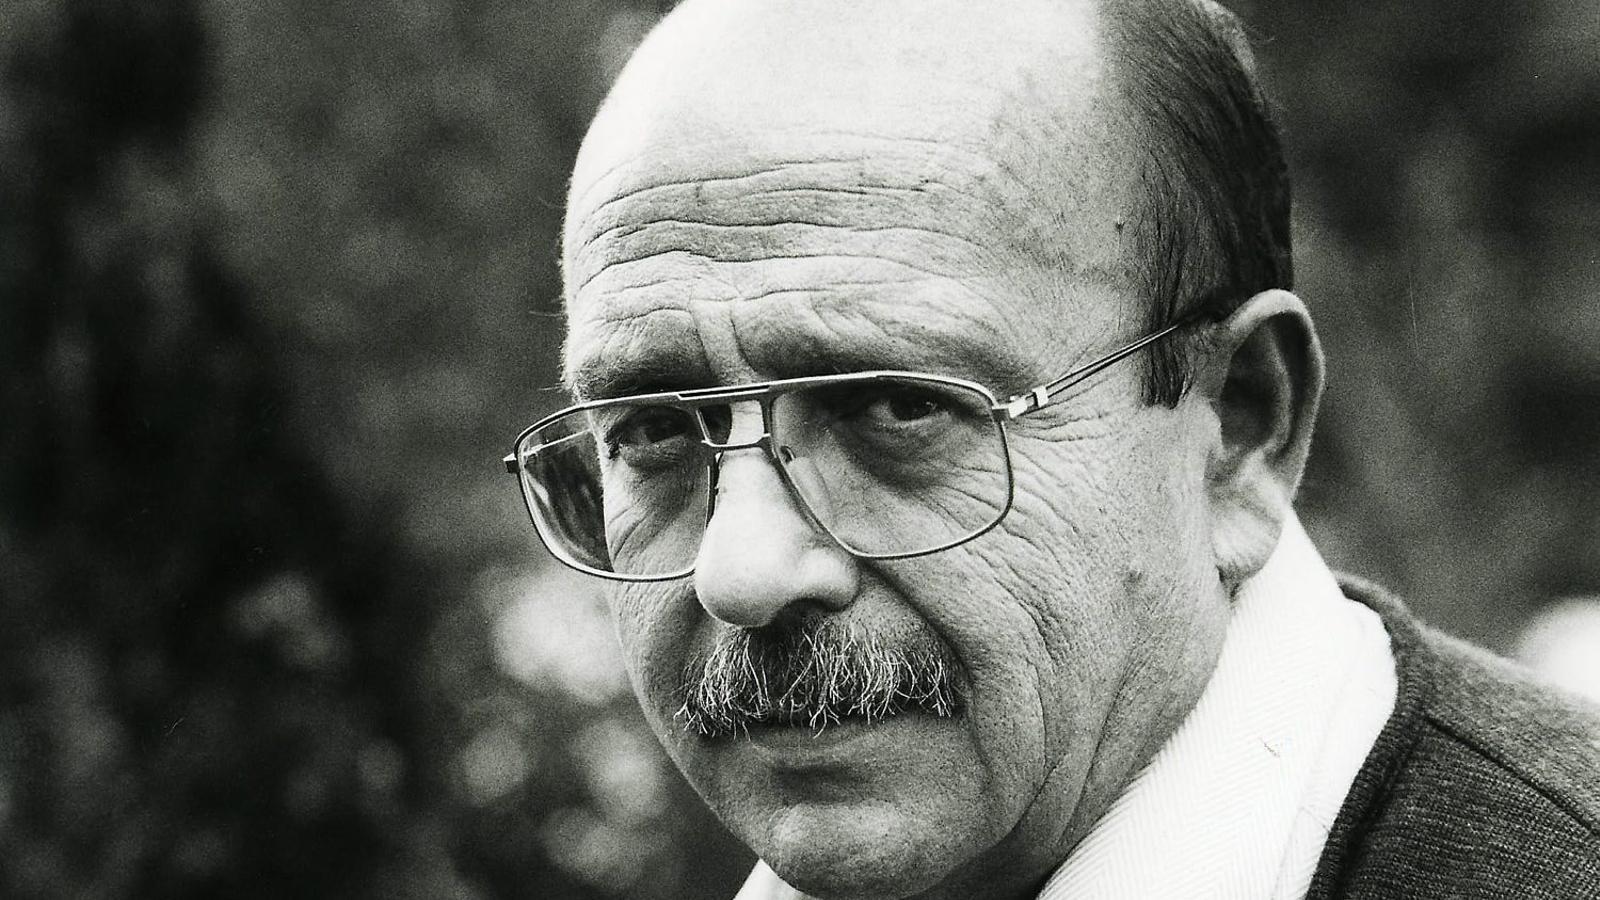 Muere Johan Cruyff a los 68 años - Página 2 Vazquez-Montalban-Croniques-del-cruyffisme_1553254664_28211343_651x366